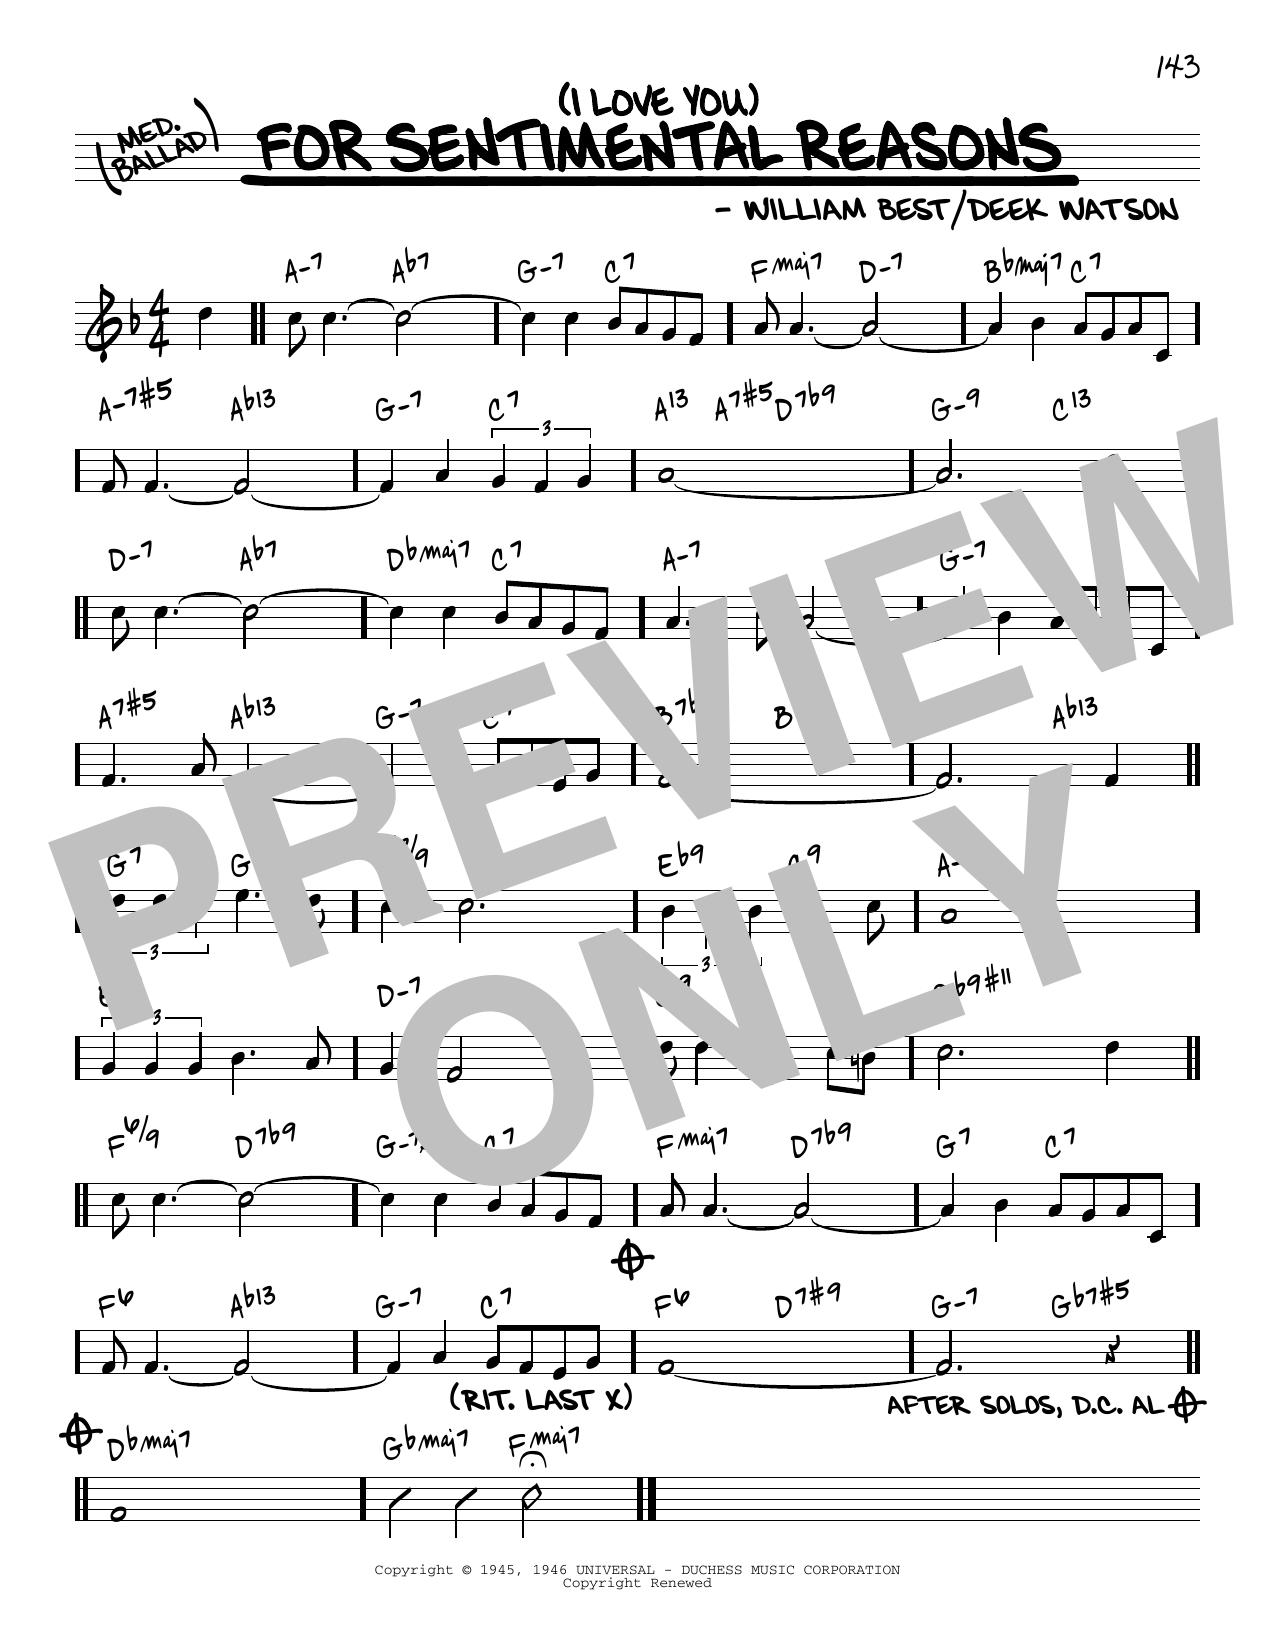 King Cole Trio (I Love You) For Sentimental Reasons [Reharmonized version] (arr. Jack Grassel) sheet music notes printable PDF score